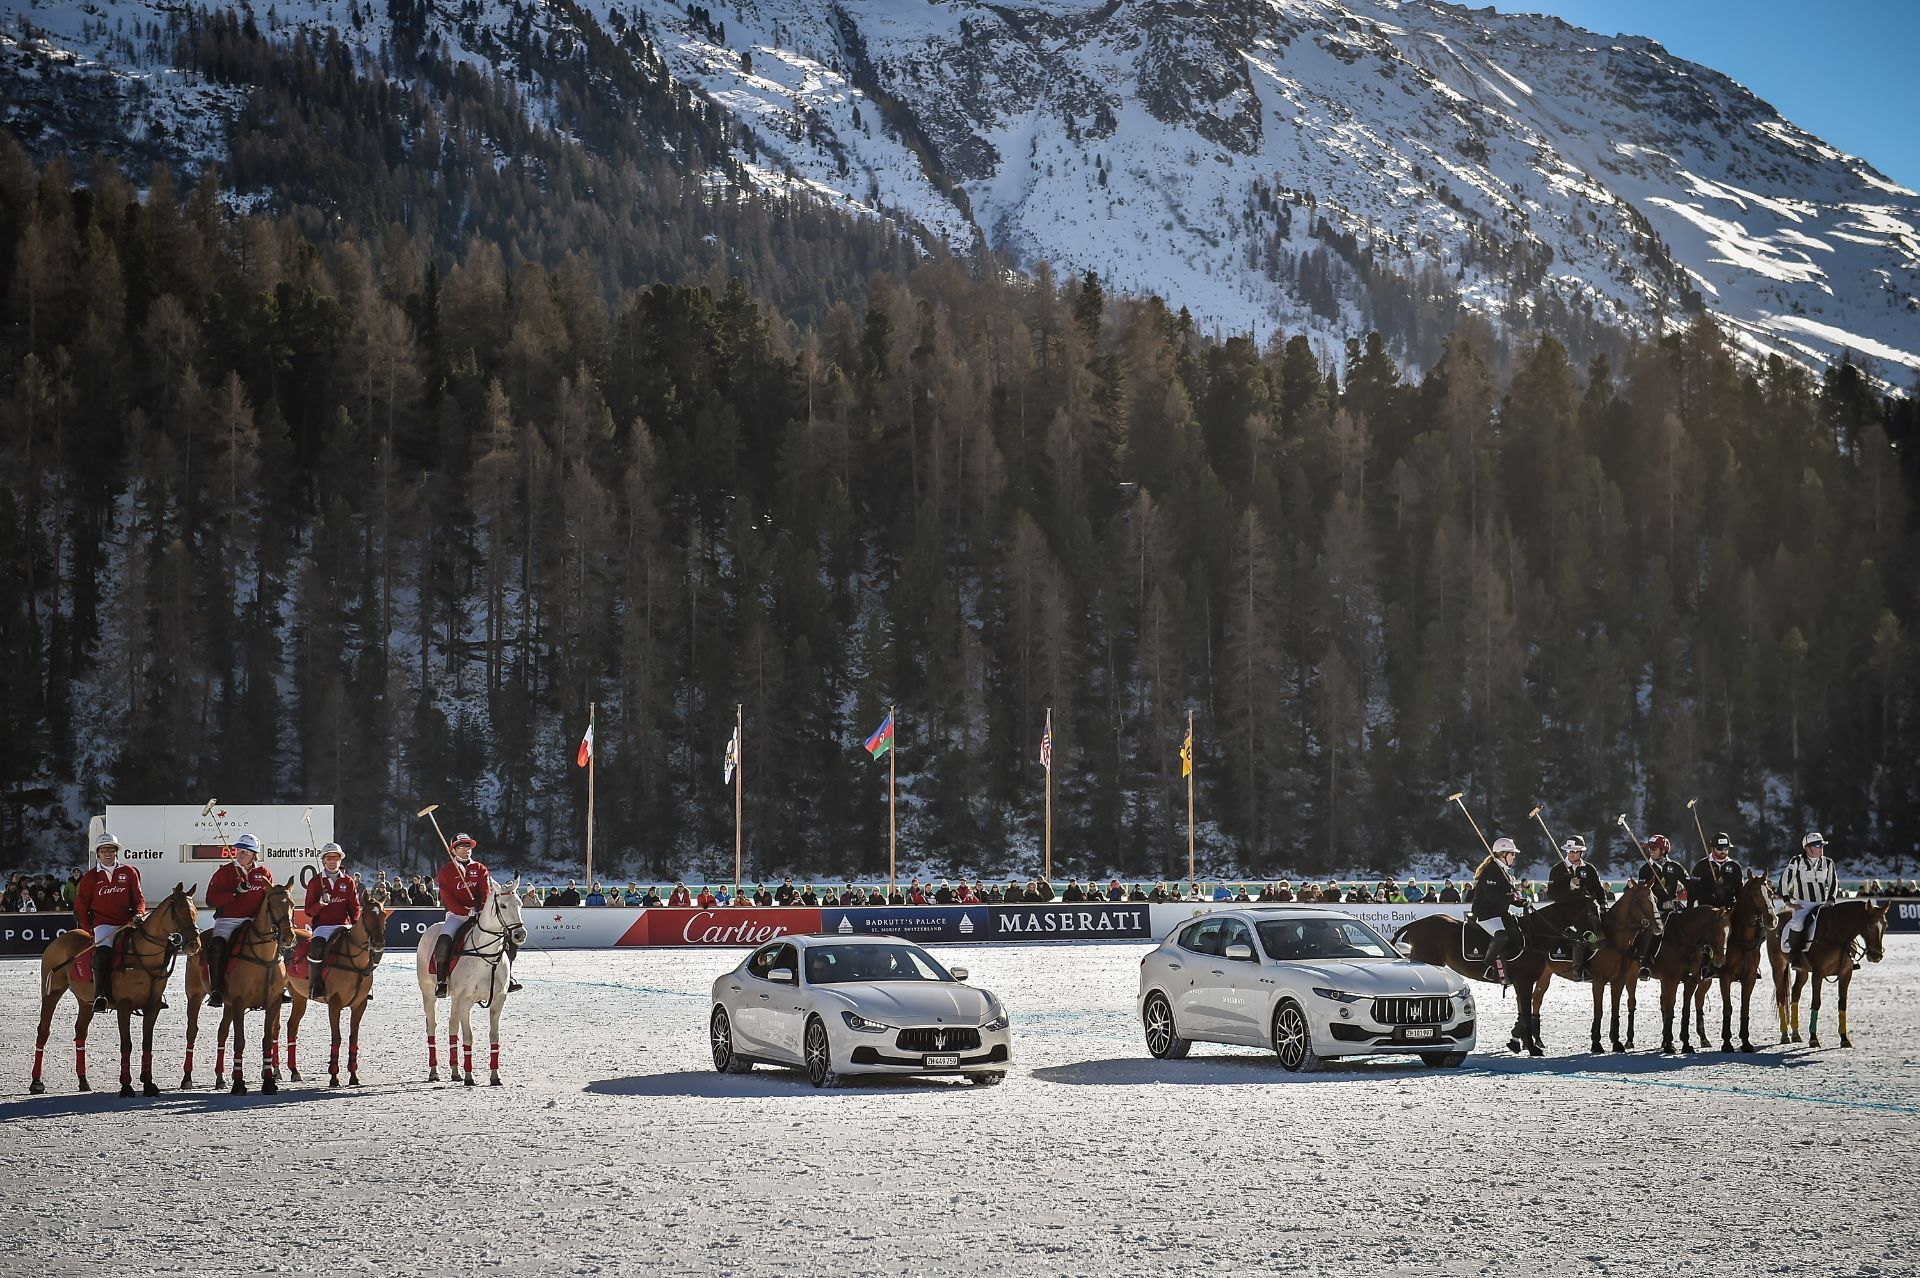 "La ""Snow Polo World Cup"" en ST. Moritz, punto de partida con glamour del Maserati Polo Tour 2017 en colaboración con La Martina"